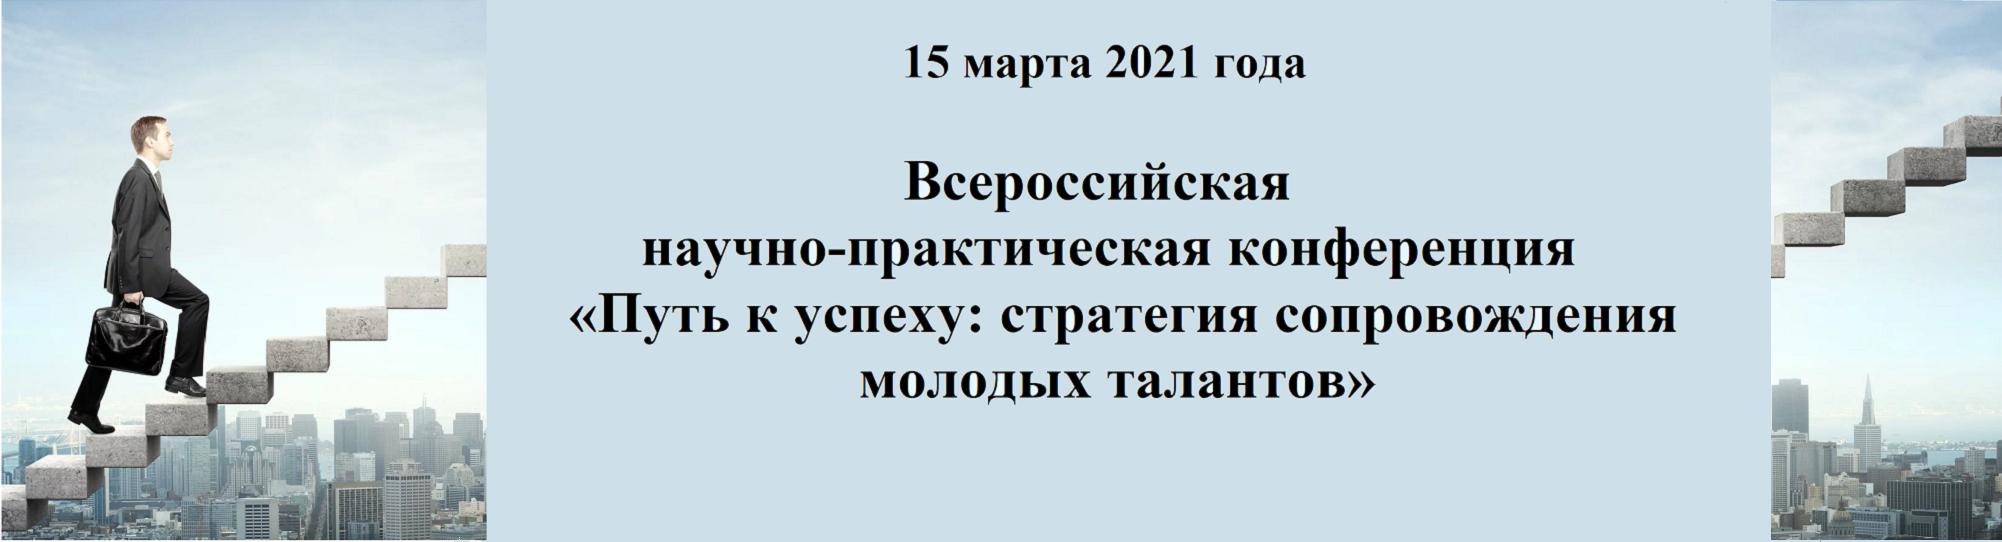 баннер 15.03.21